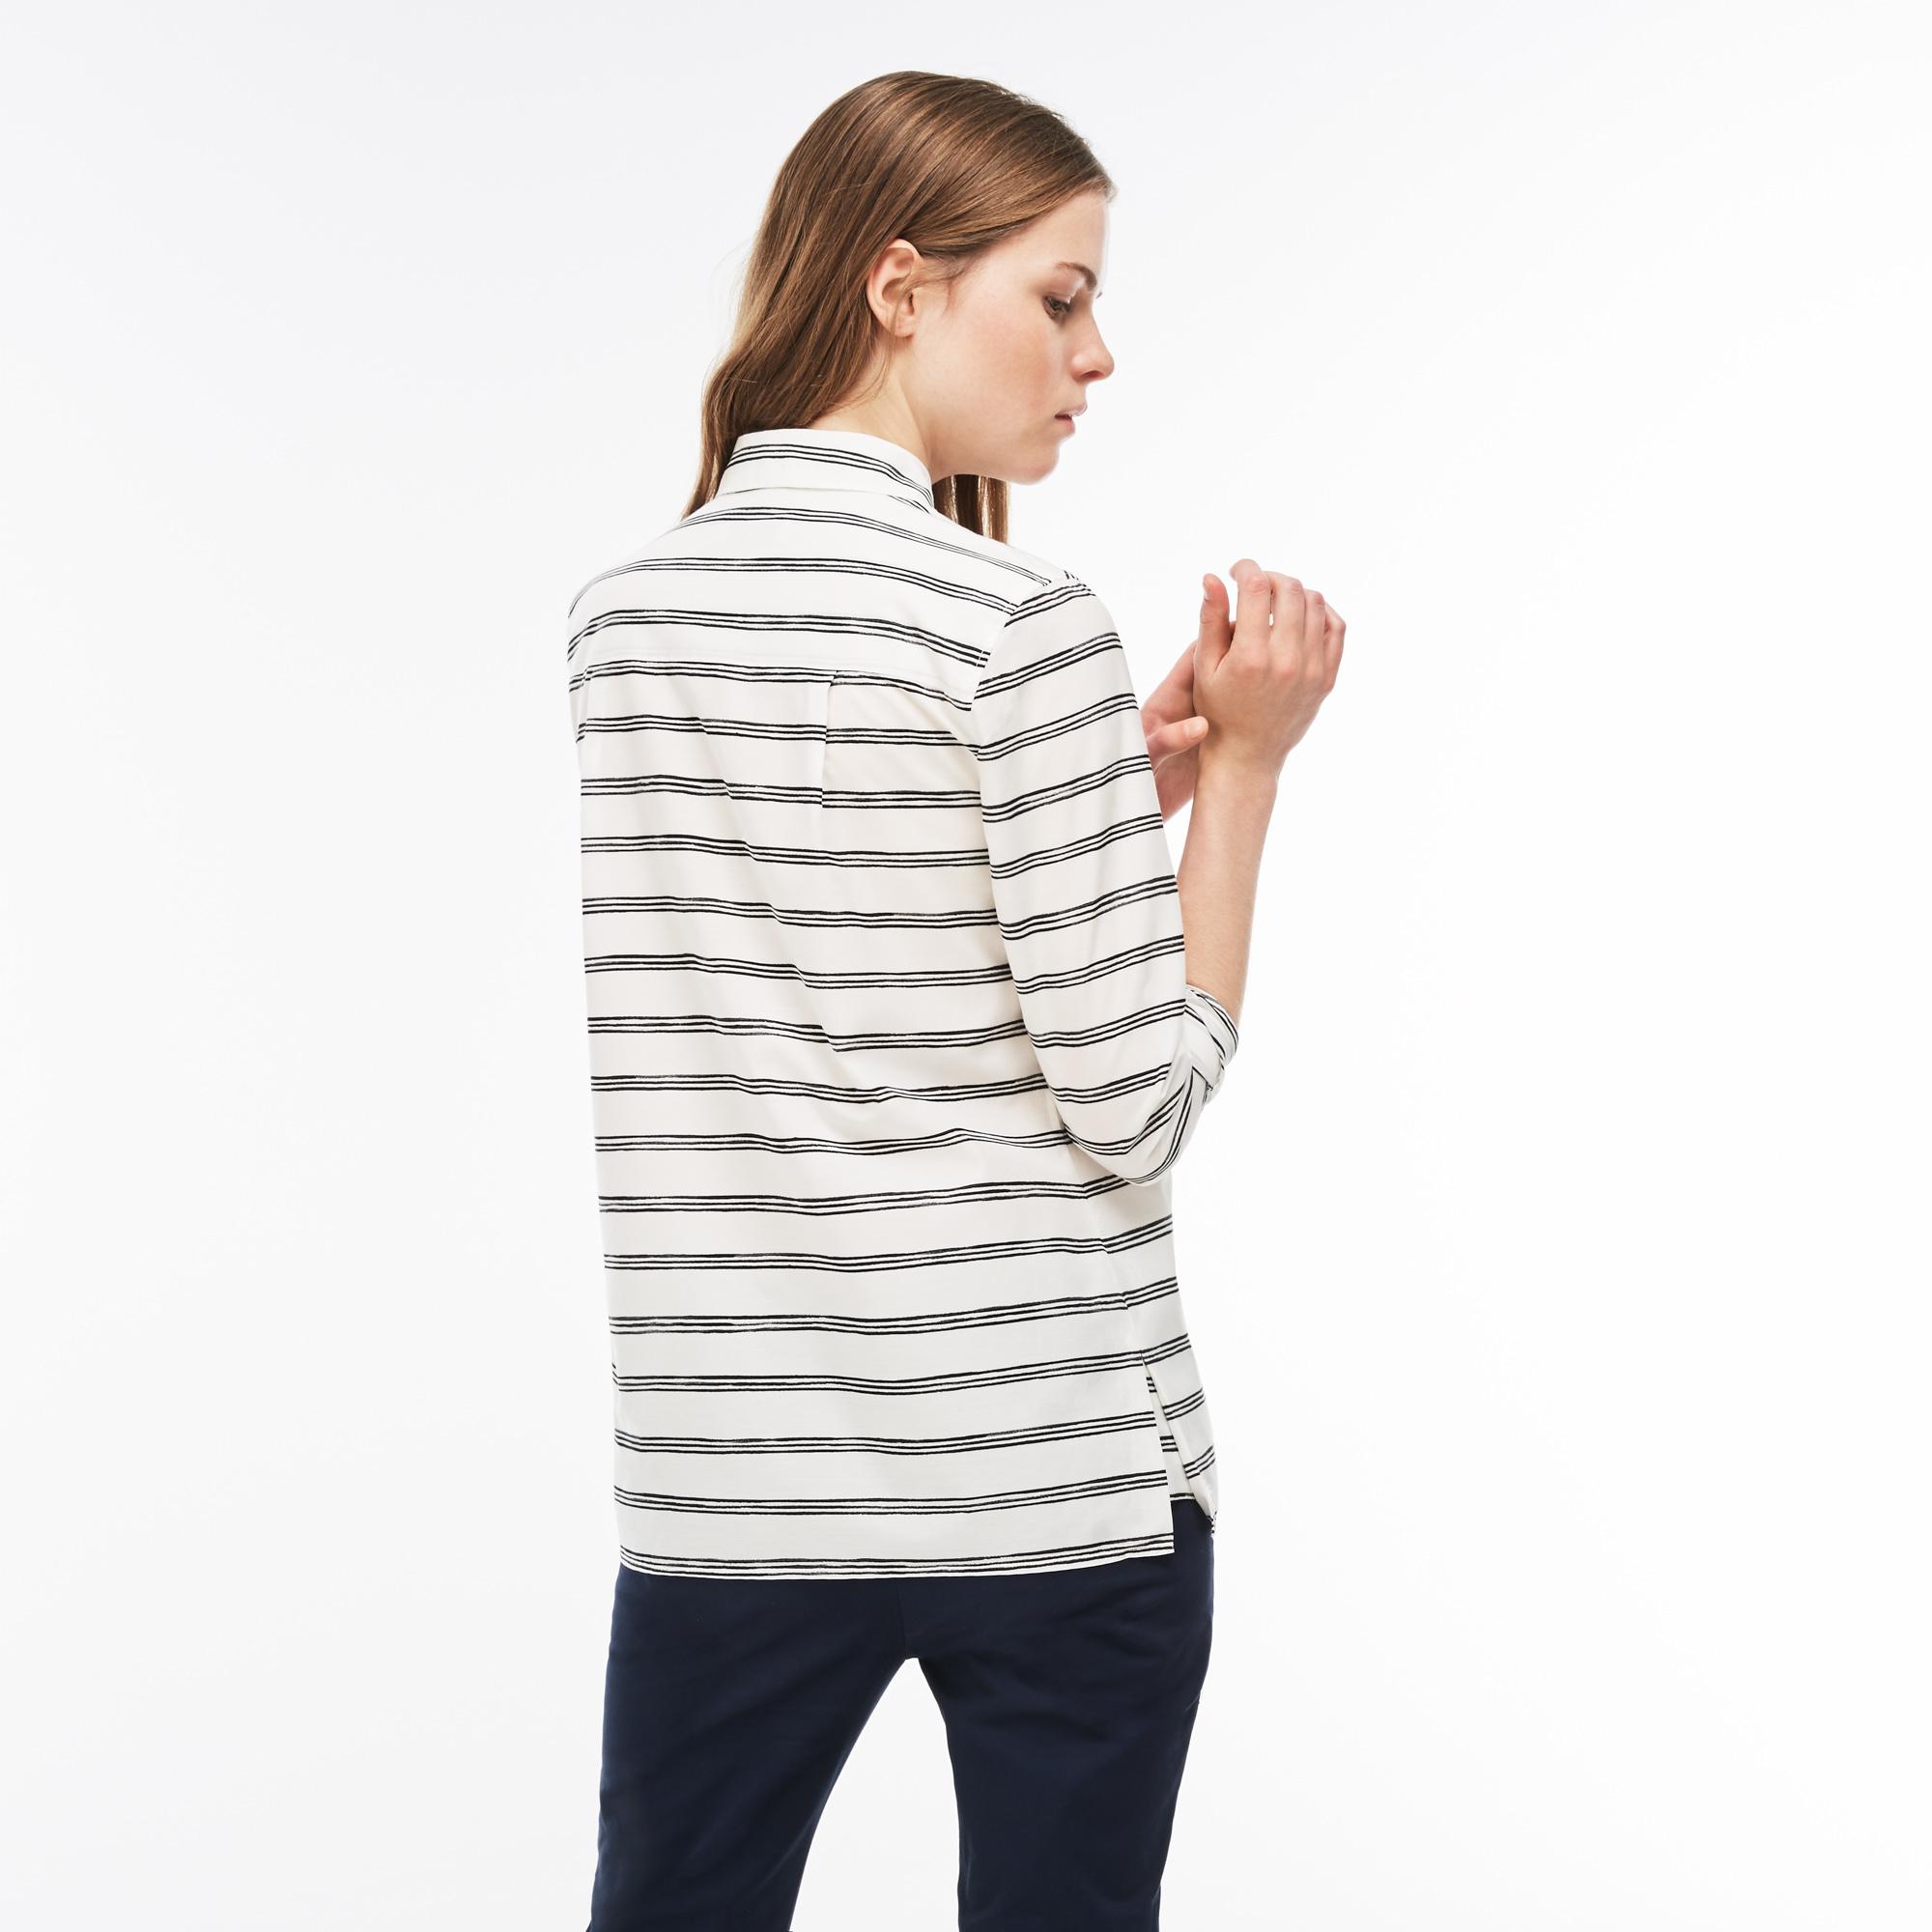 Фото 2 - Рубашку Lacoste Regular fit белого цвета